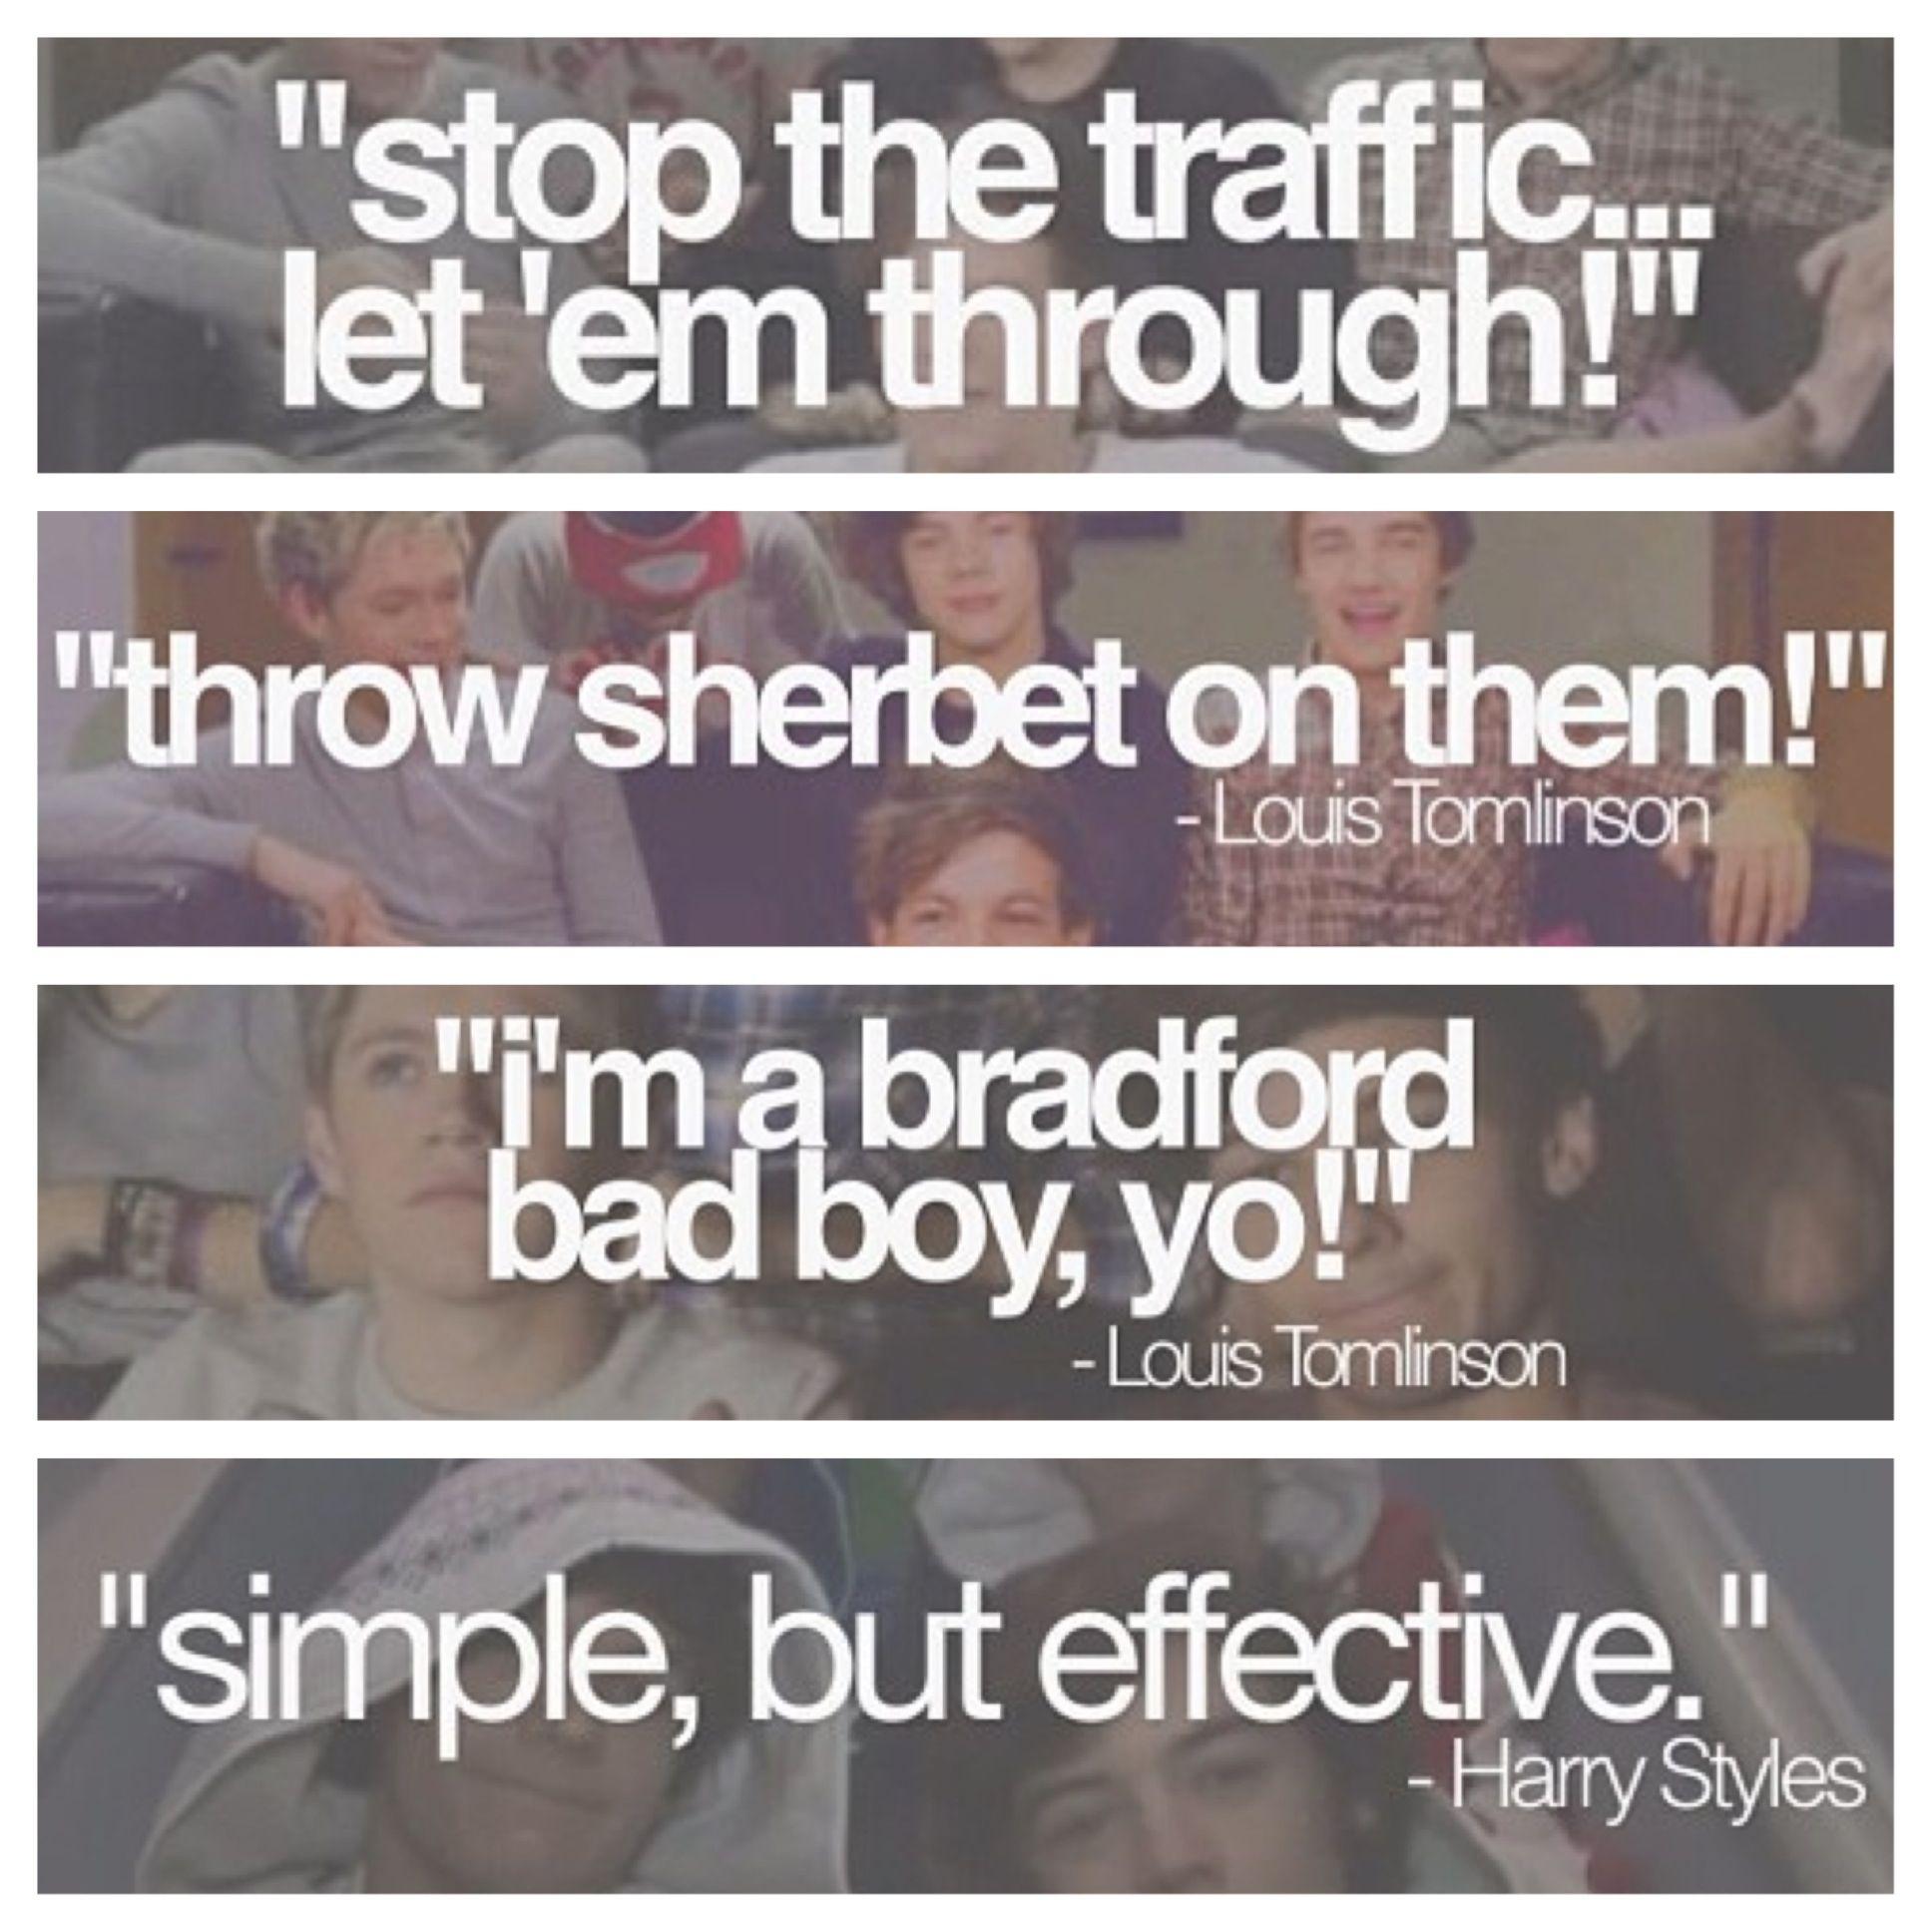 Pin By Barbara Nicole On 0n3 Direction I Love One Direction 1d Quotes One Direction